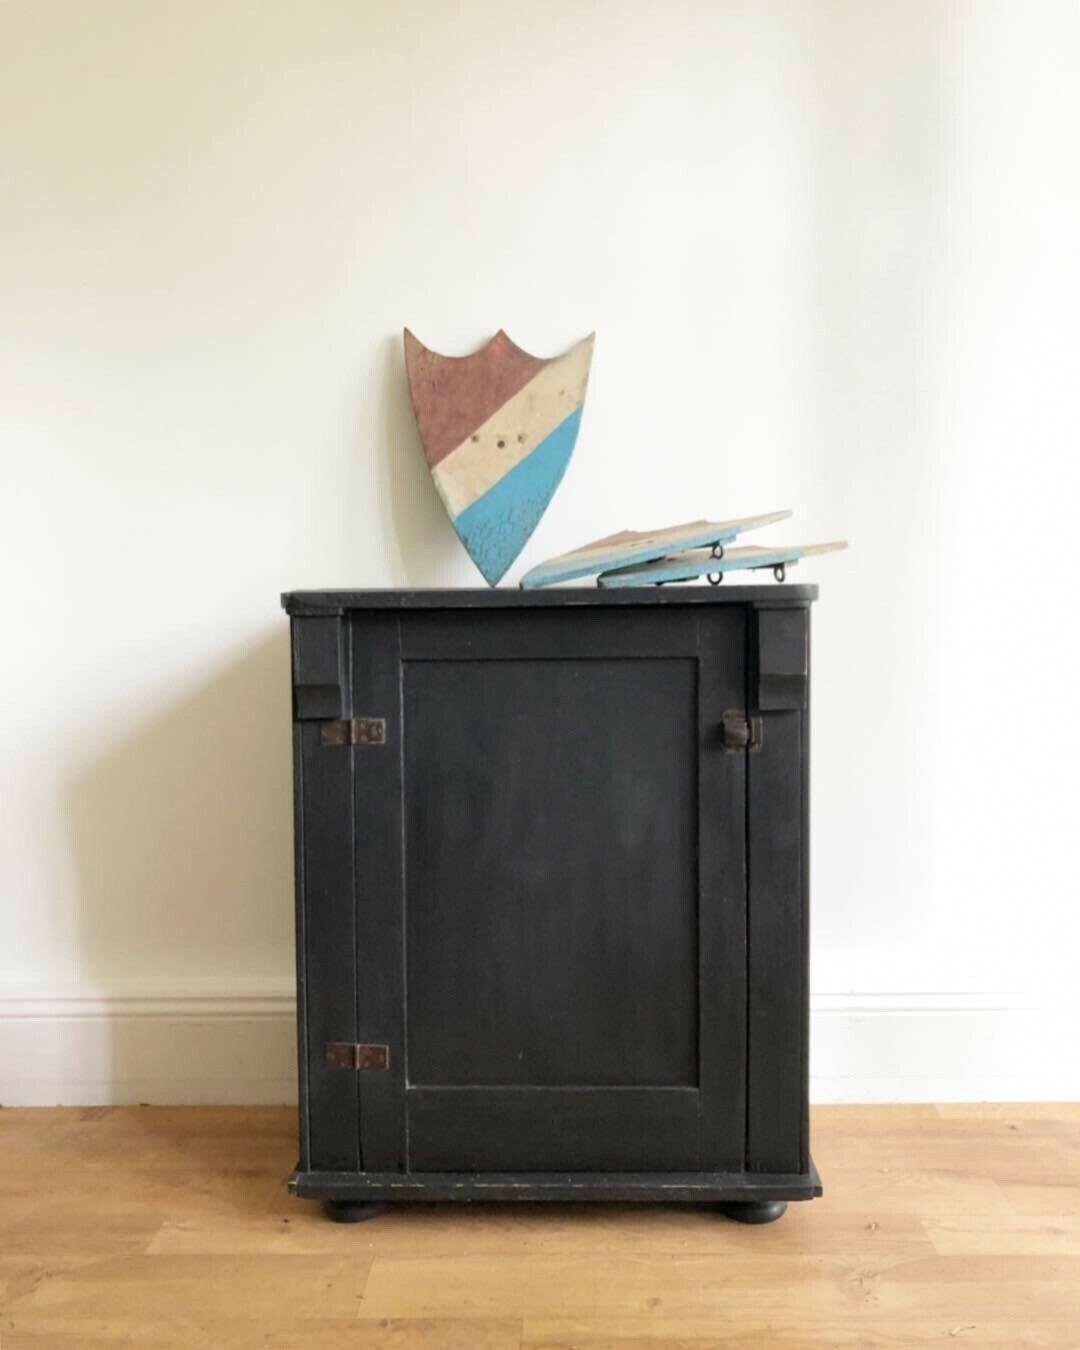 Lovely Antique Vintage French Black Painted Kitchen Cabinet Cupboard Dress Base Vinterior Sent To Lond Painting Kitchen Cabinets Lovely Antiques Kitchen Paint